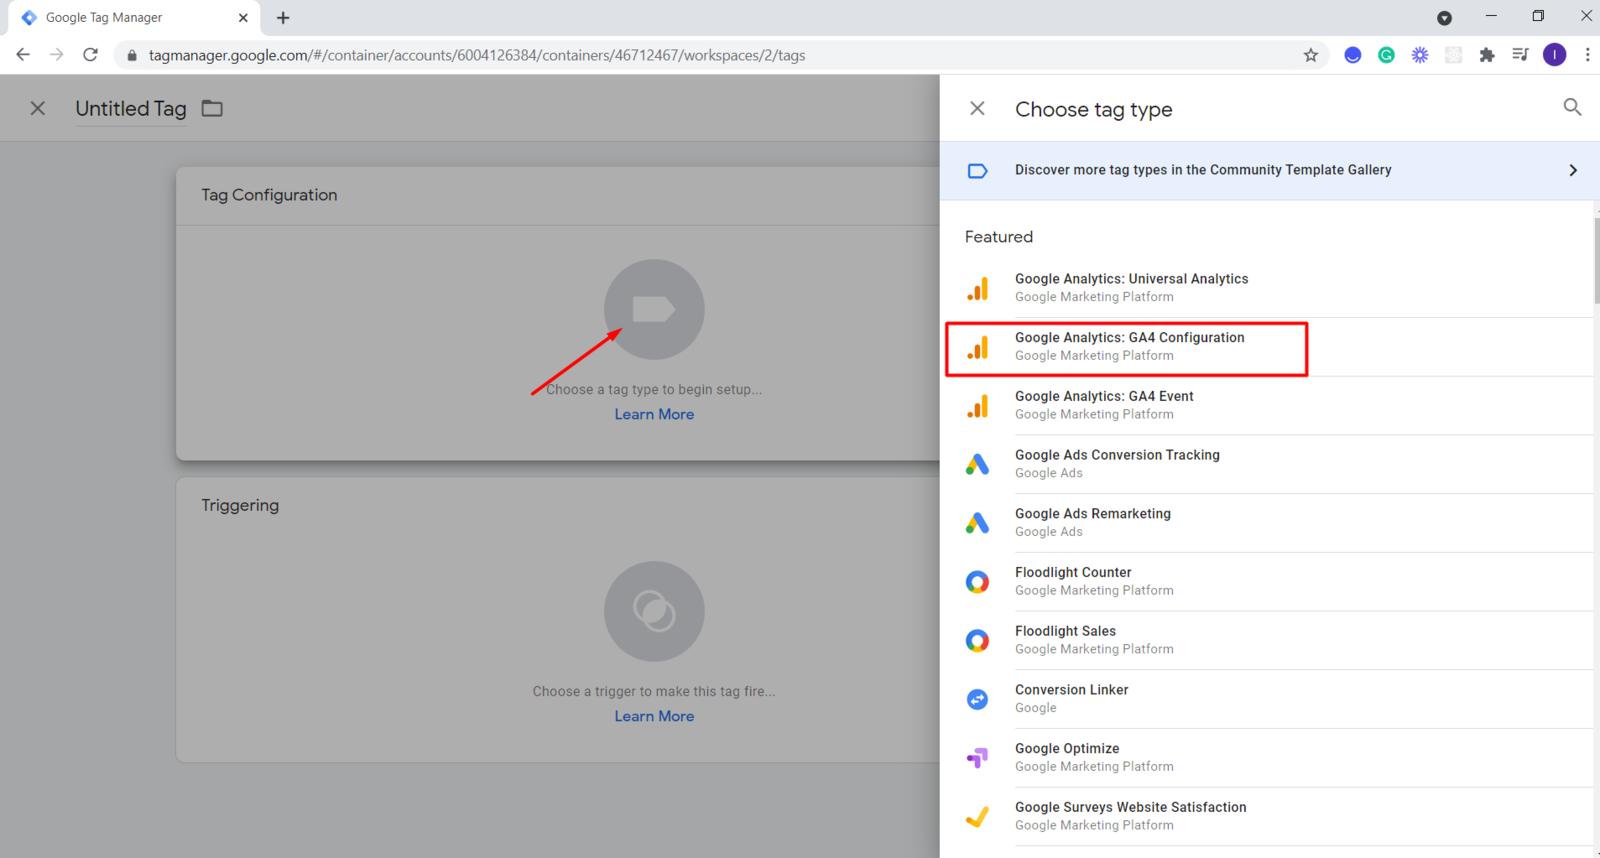 Tags => New => Choose a tag type...=> Google Analytics: GA4 Configuration